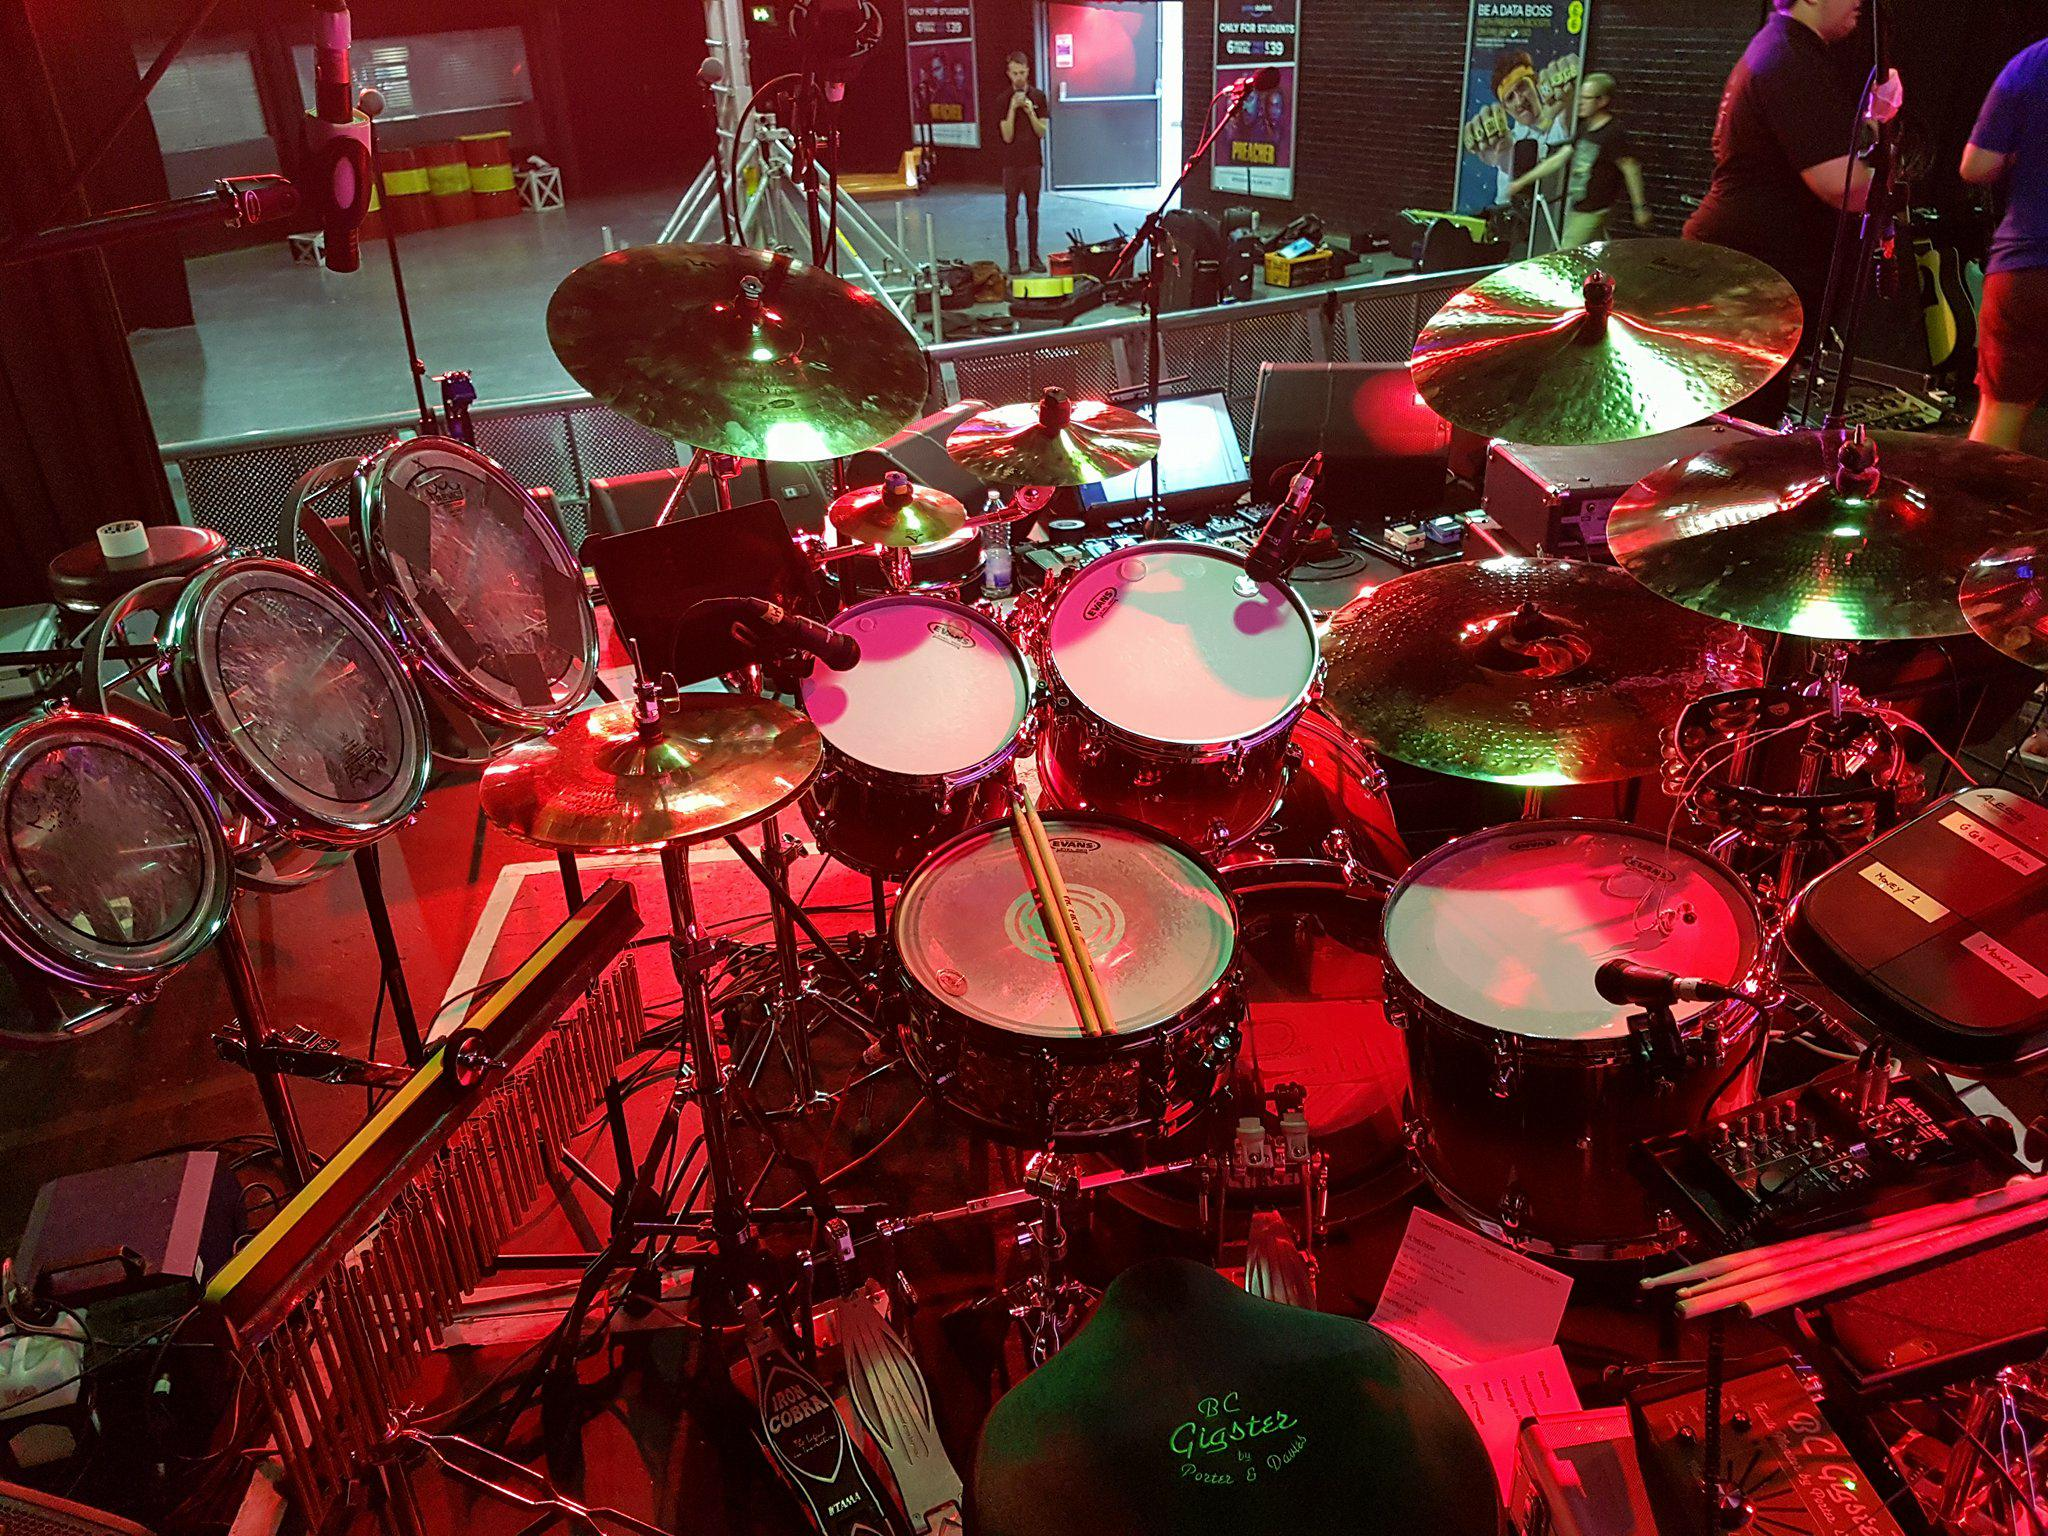 Shaun's kit